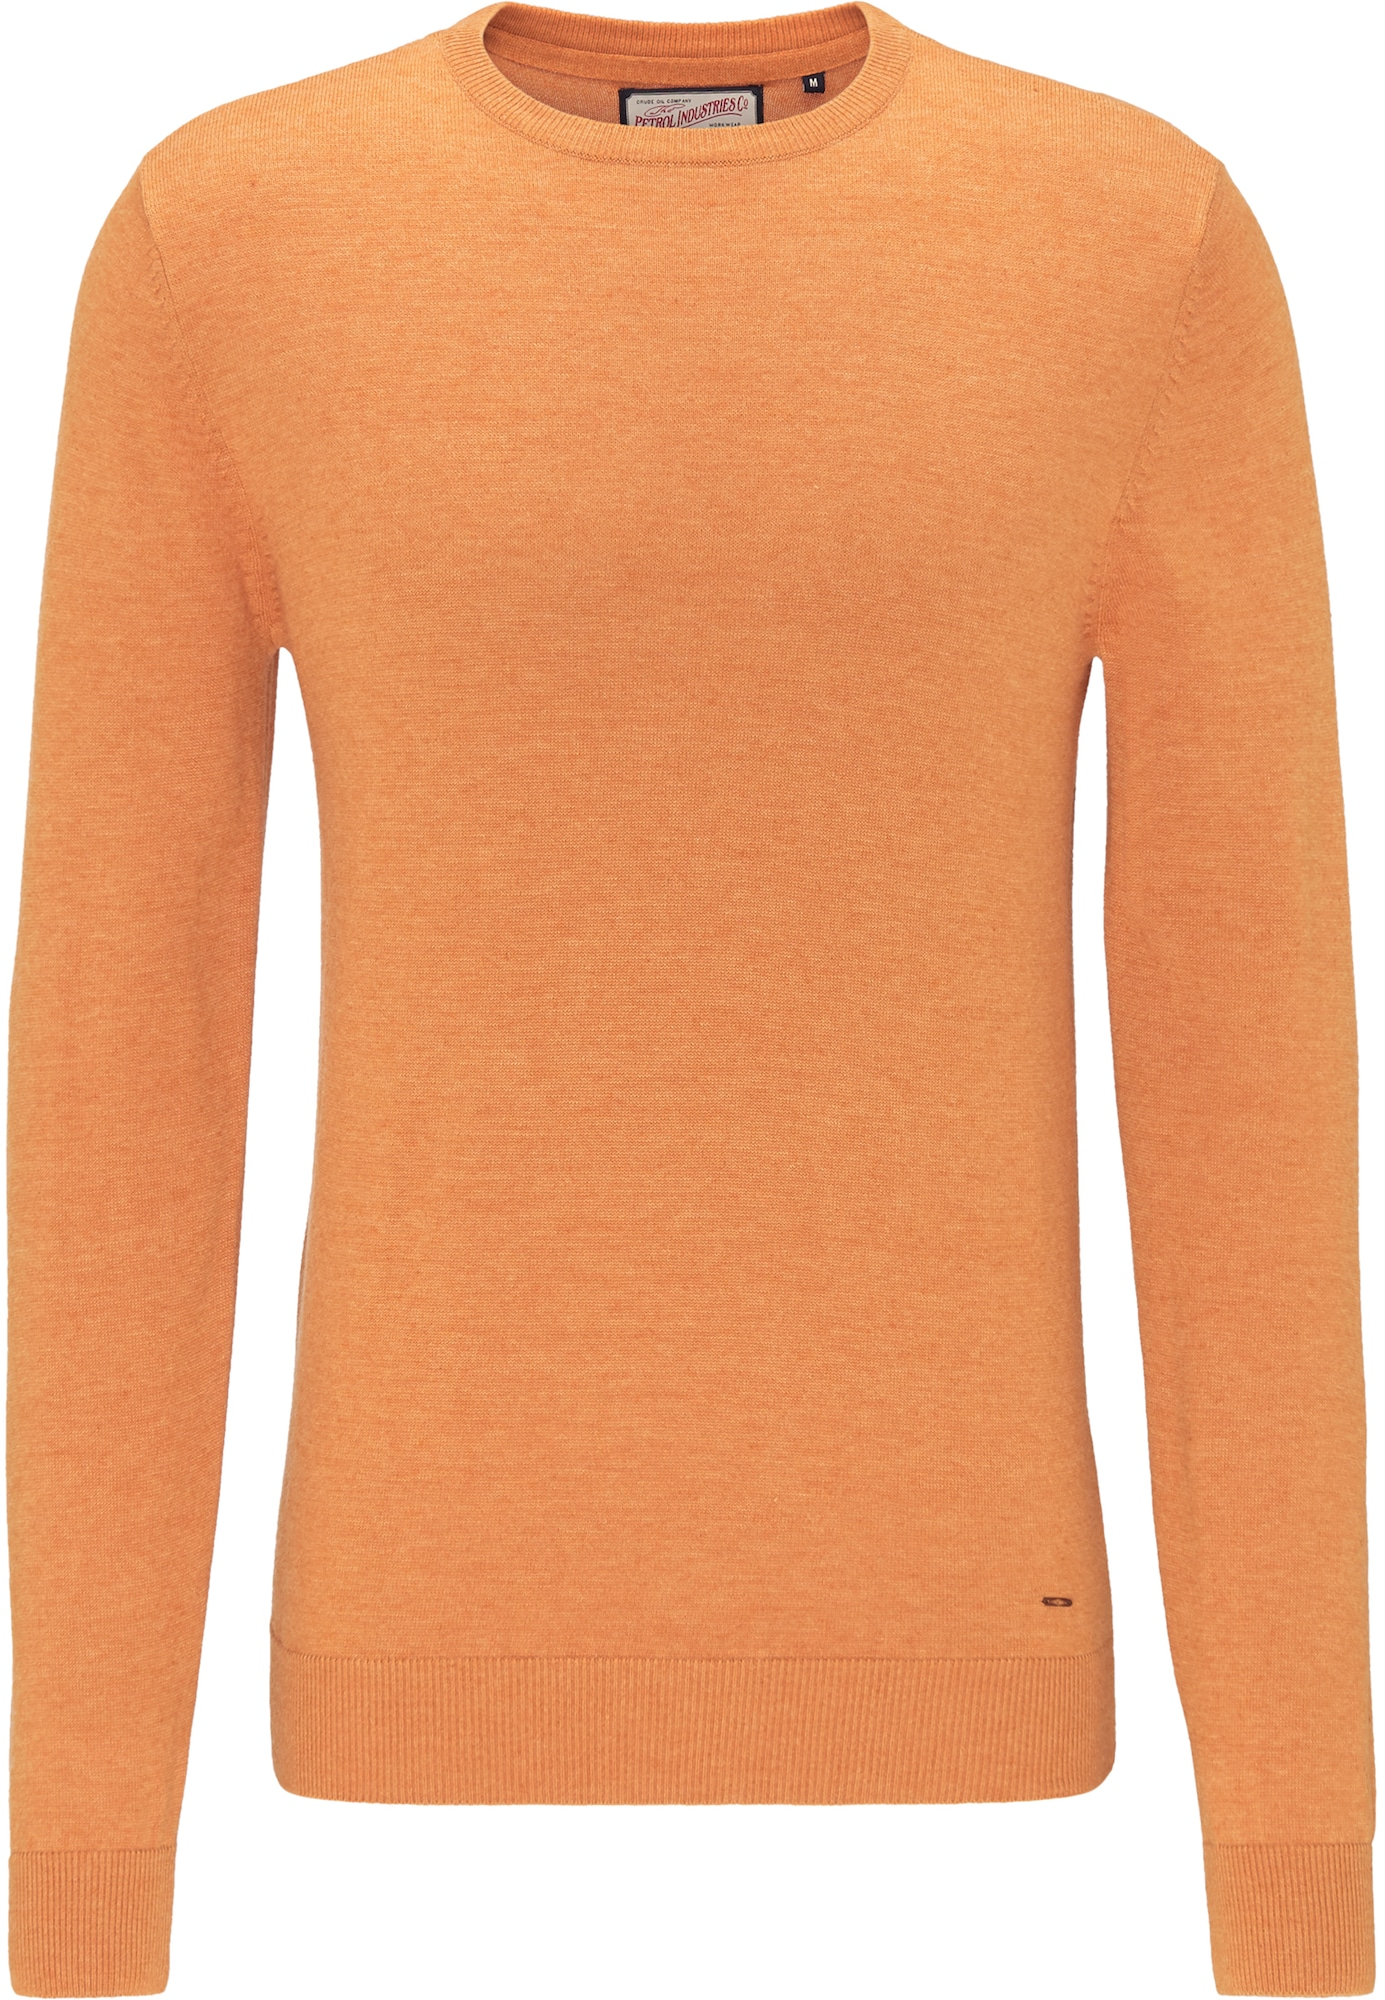 Pullover | Bekleidung > Pullover > Sonstige Pullover | Petrol Industries